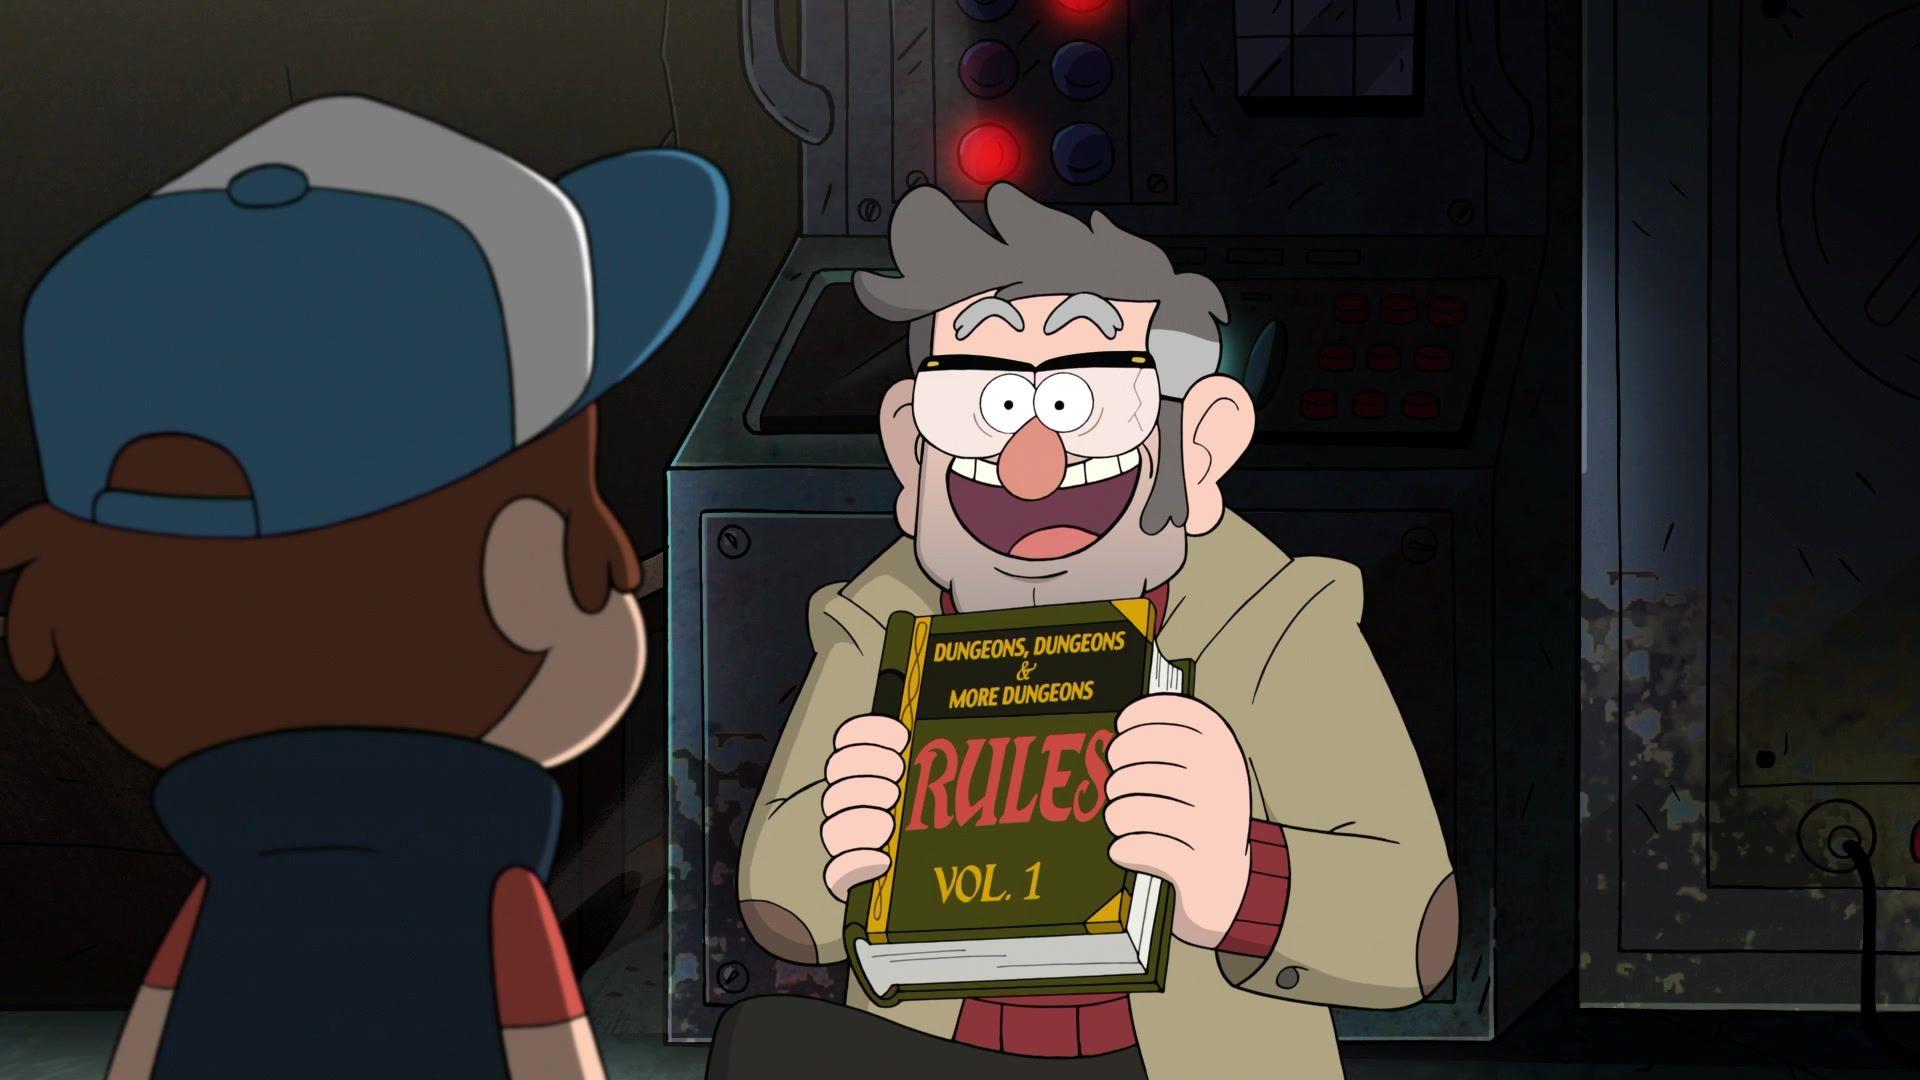 Gravity Falls Dipper And Wendy Wallpaper Dungeons Dungeons Amp More Dungeons Gravity Falls S02e13